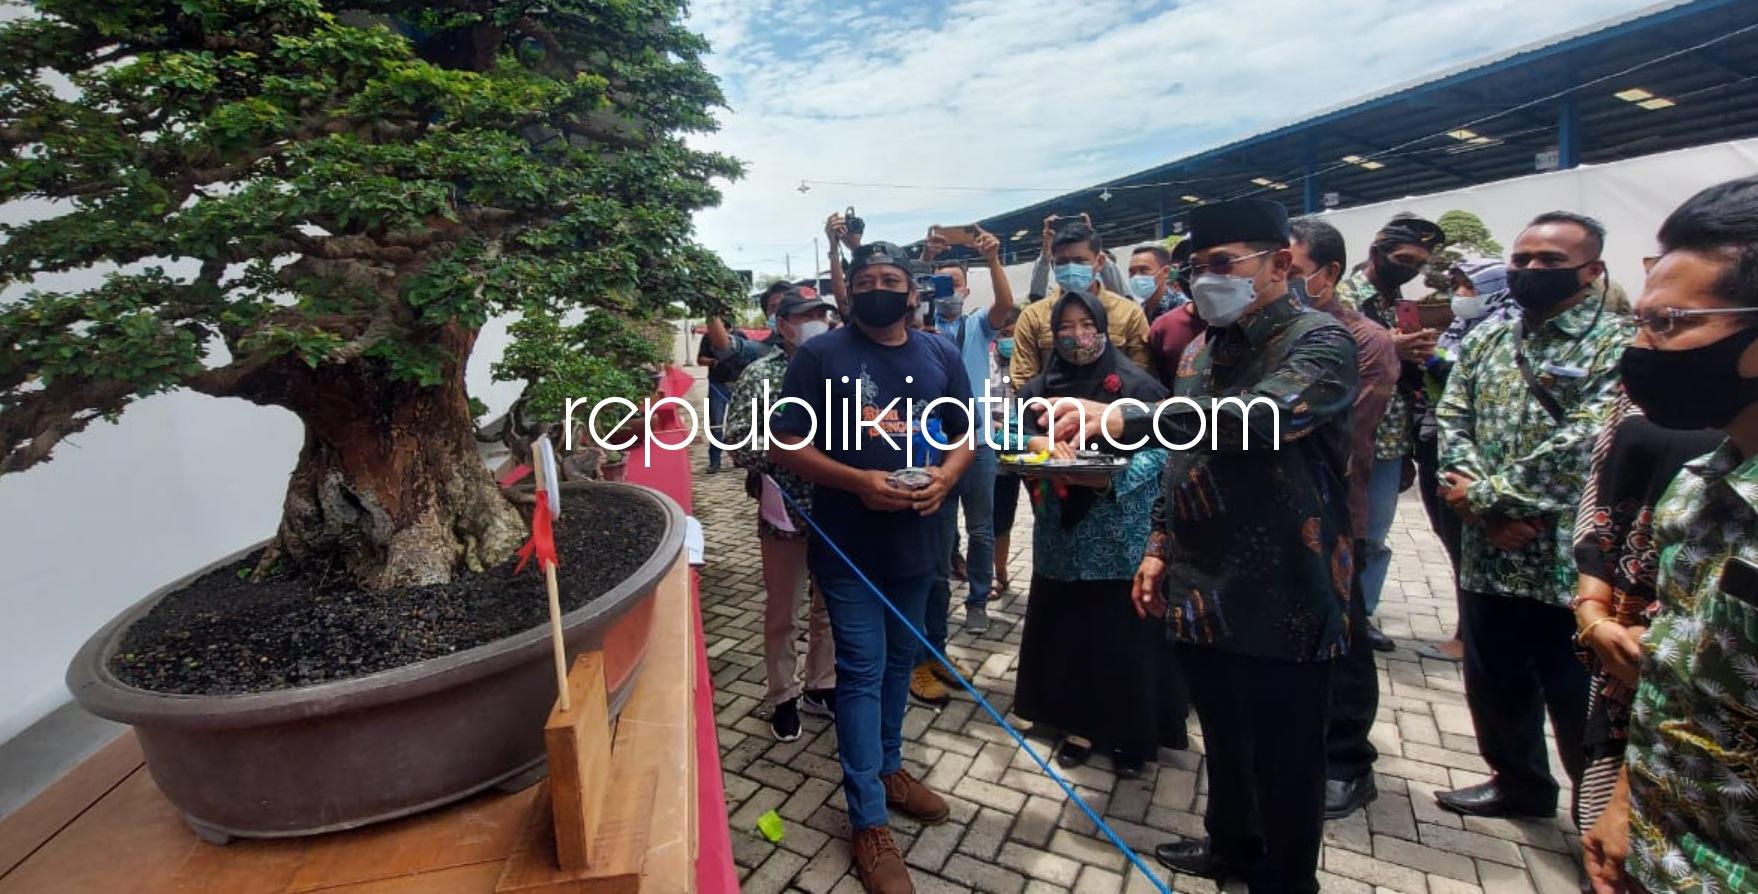 Bisnis Tanaman Bonsai Raup Puluhan Hingga Ratusan Juta Rupiah di Tengah Pandemi Covid-19